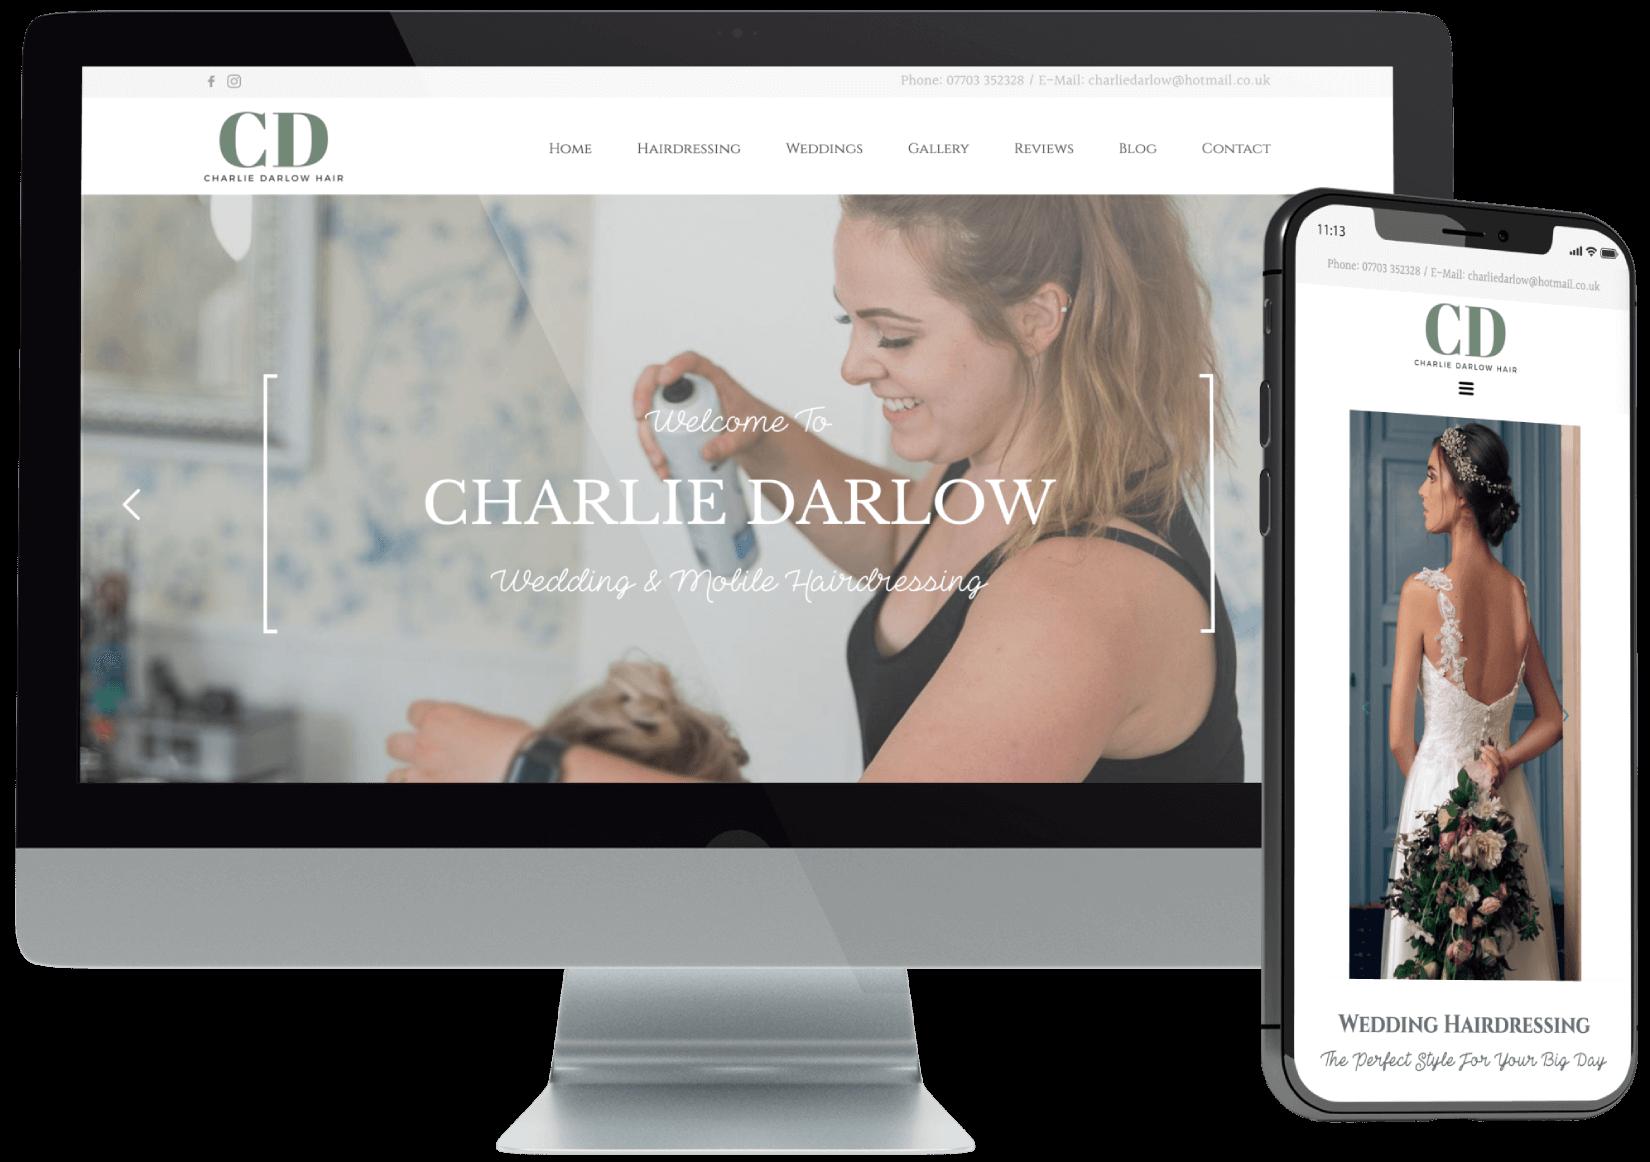 Charlie Darlow Website Design